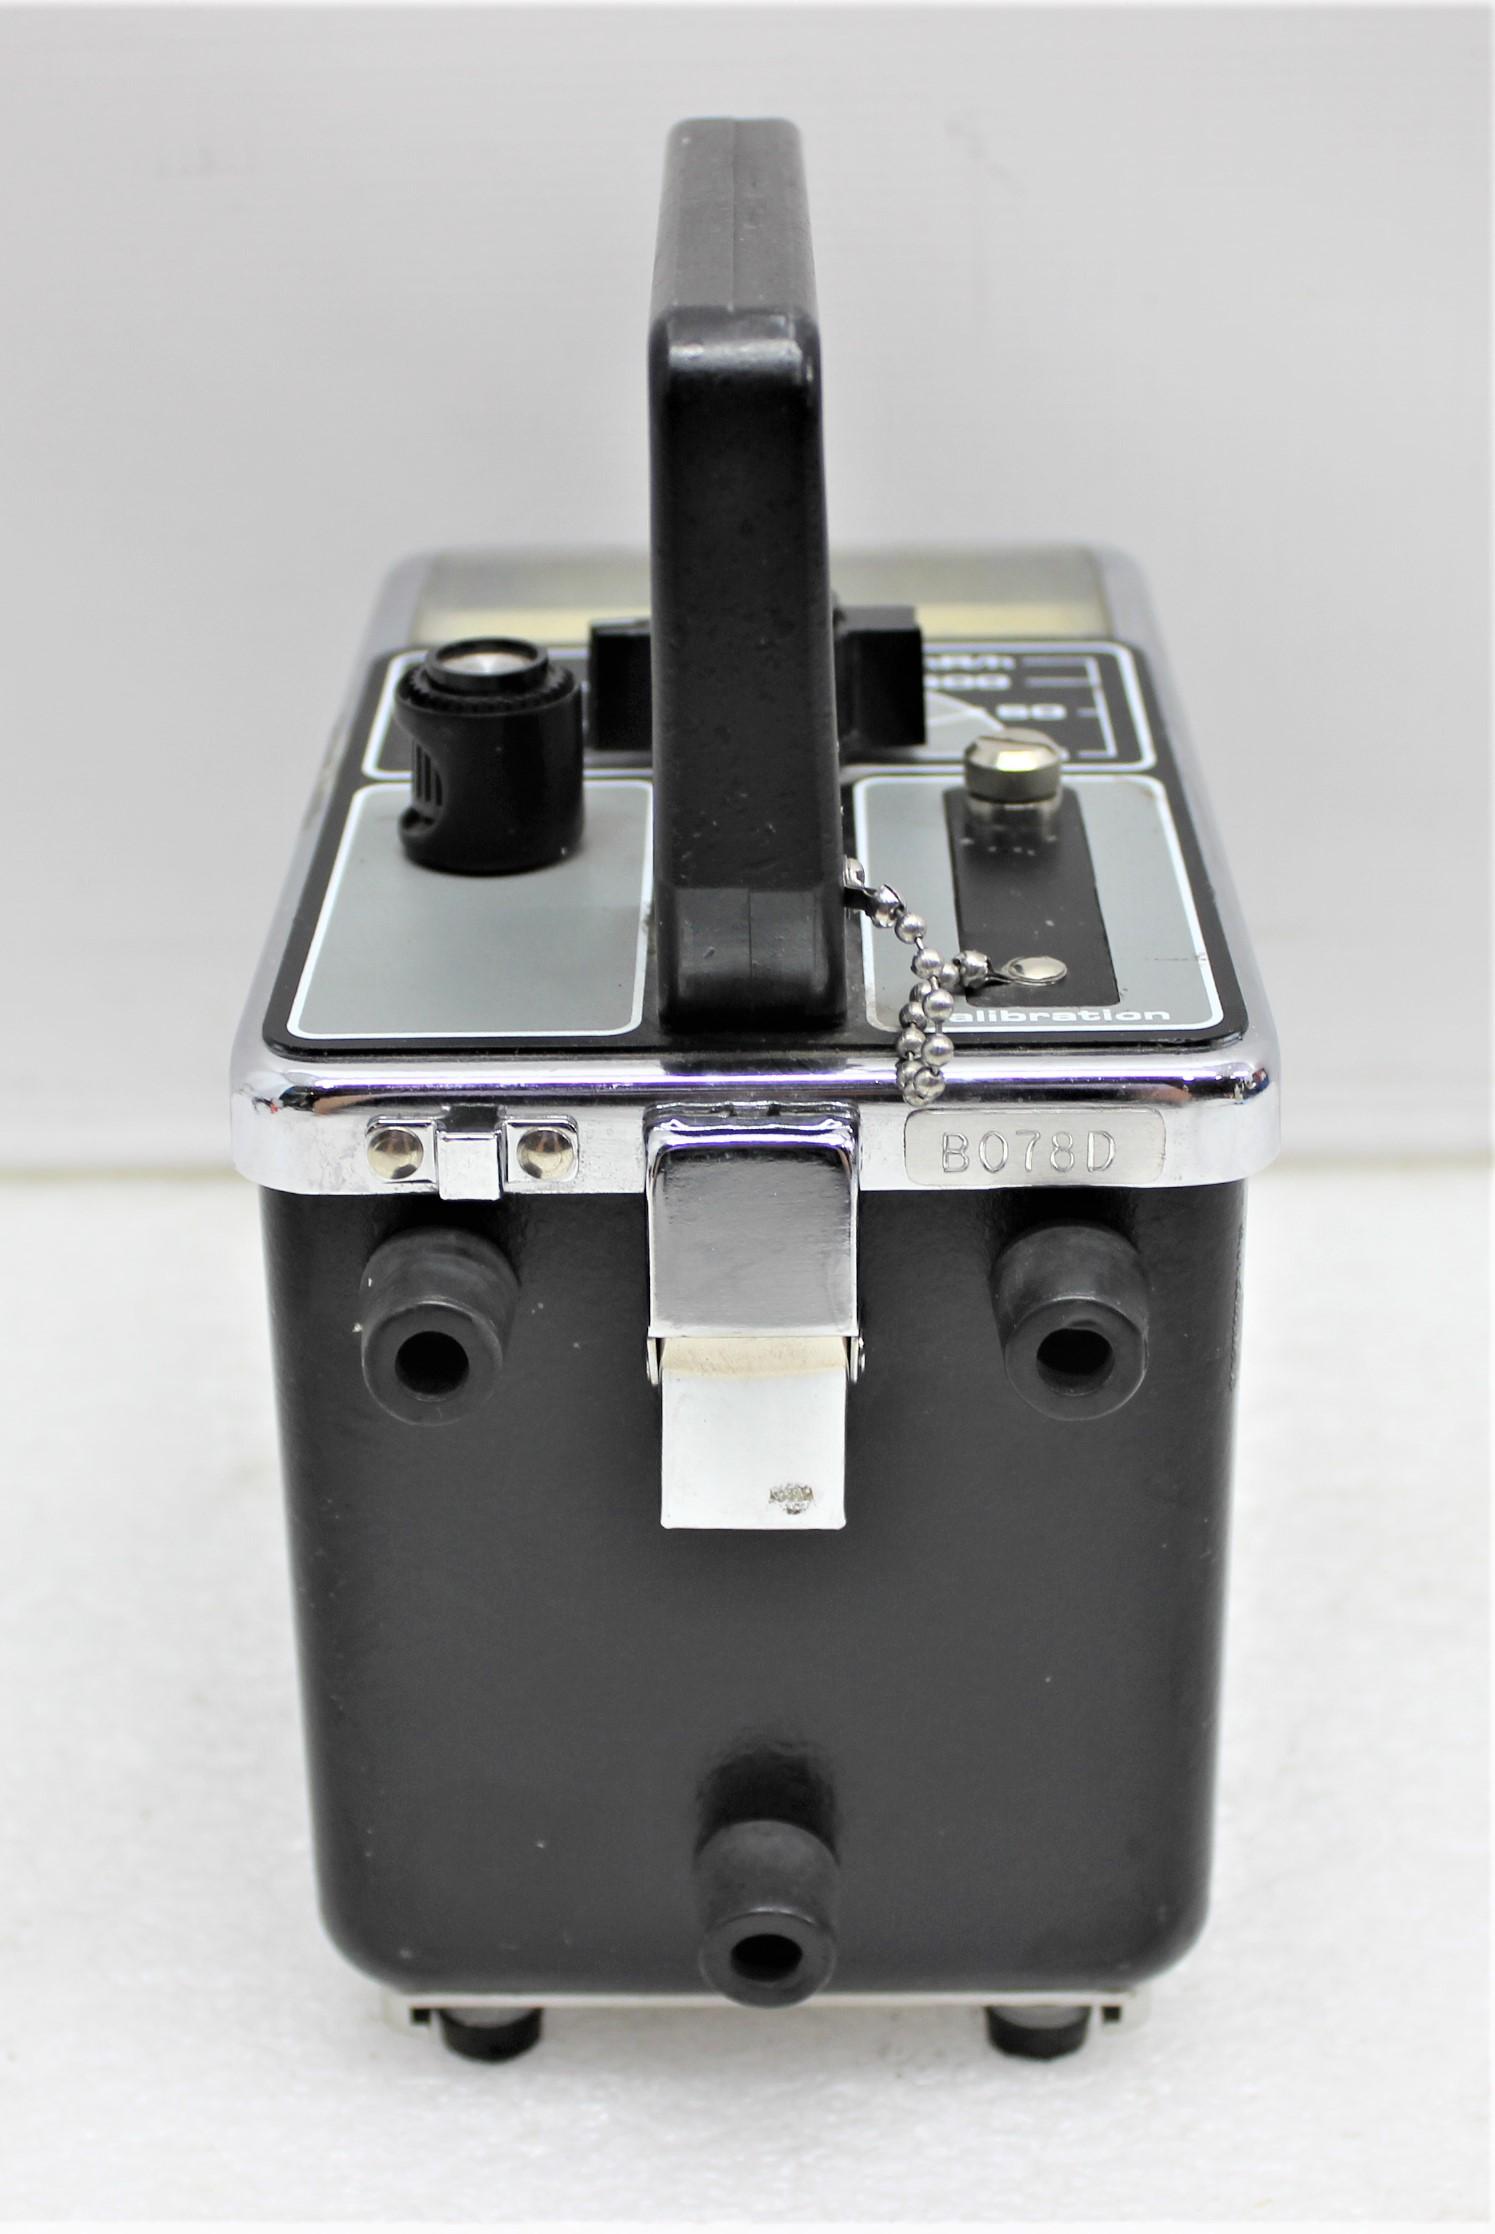 Image BICRON RSO-5 Portable Survey Meter 1587247